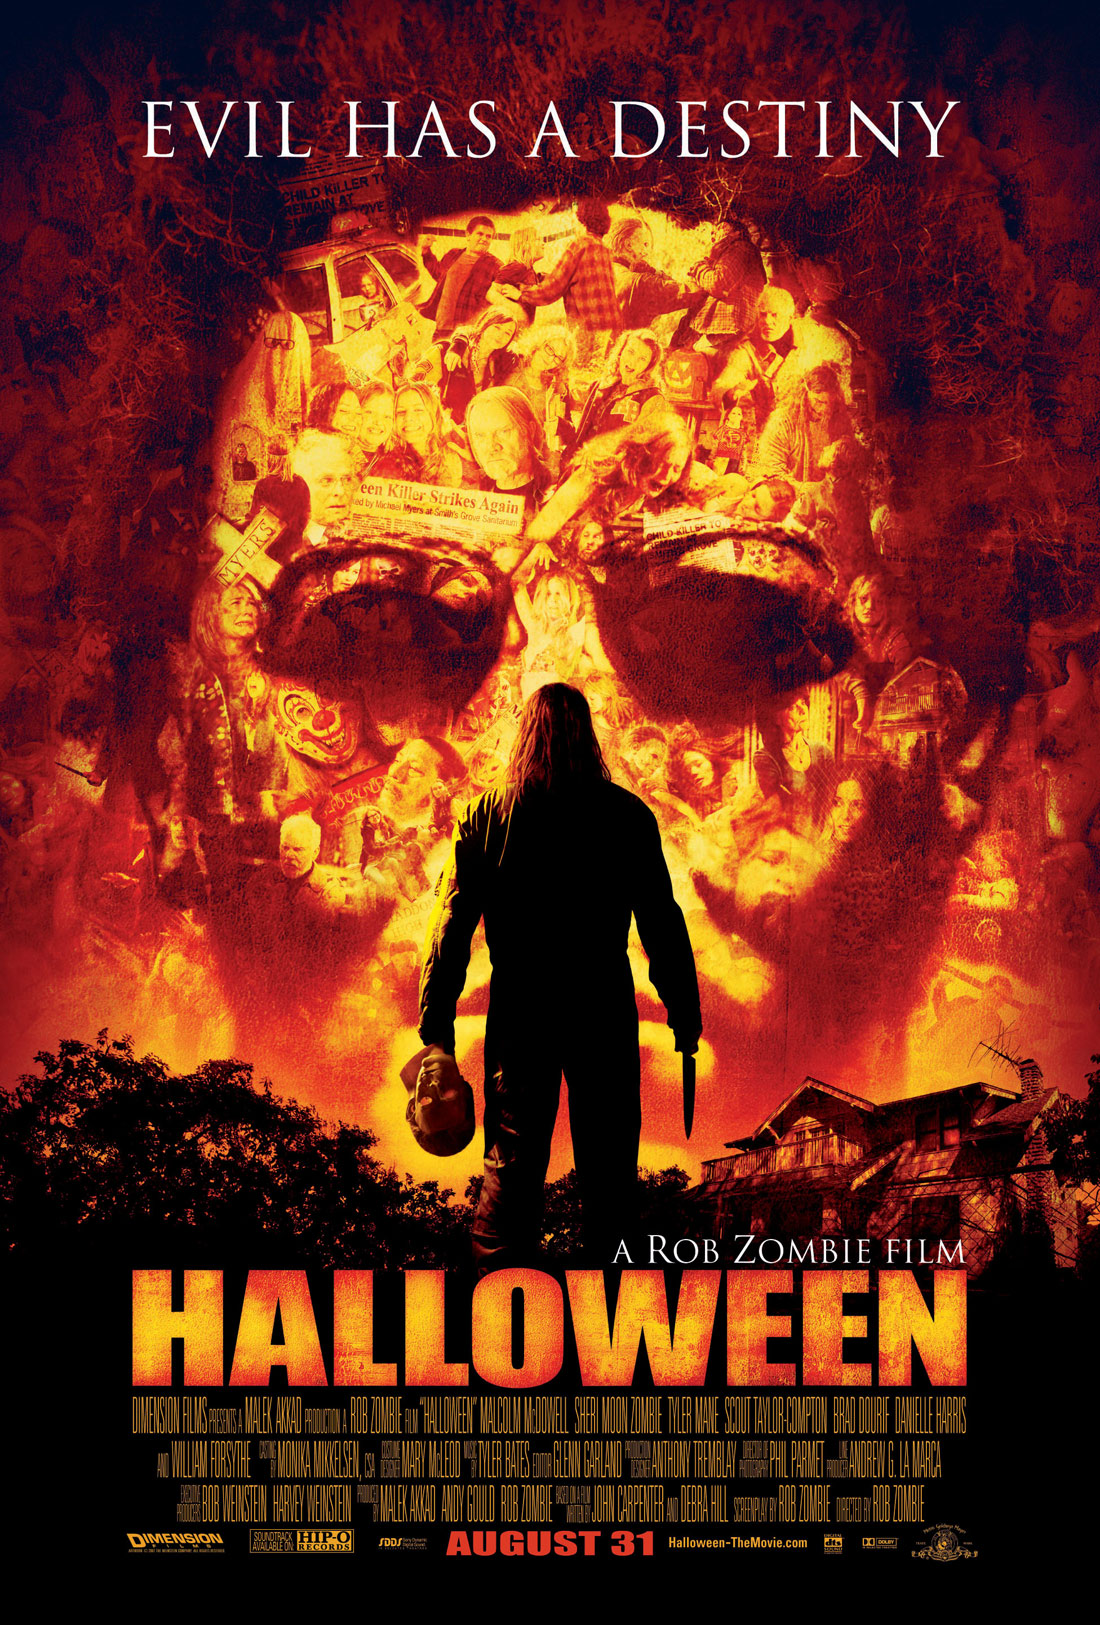 halloween remake movie poster 2007 rob zombie1 Free Teenage Pussy. vagina of teenager